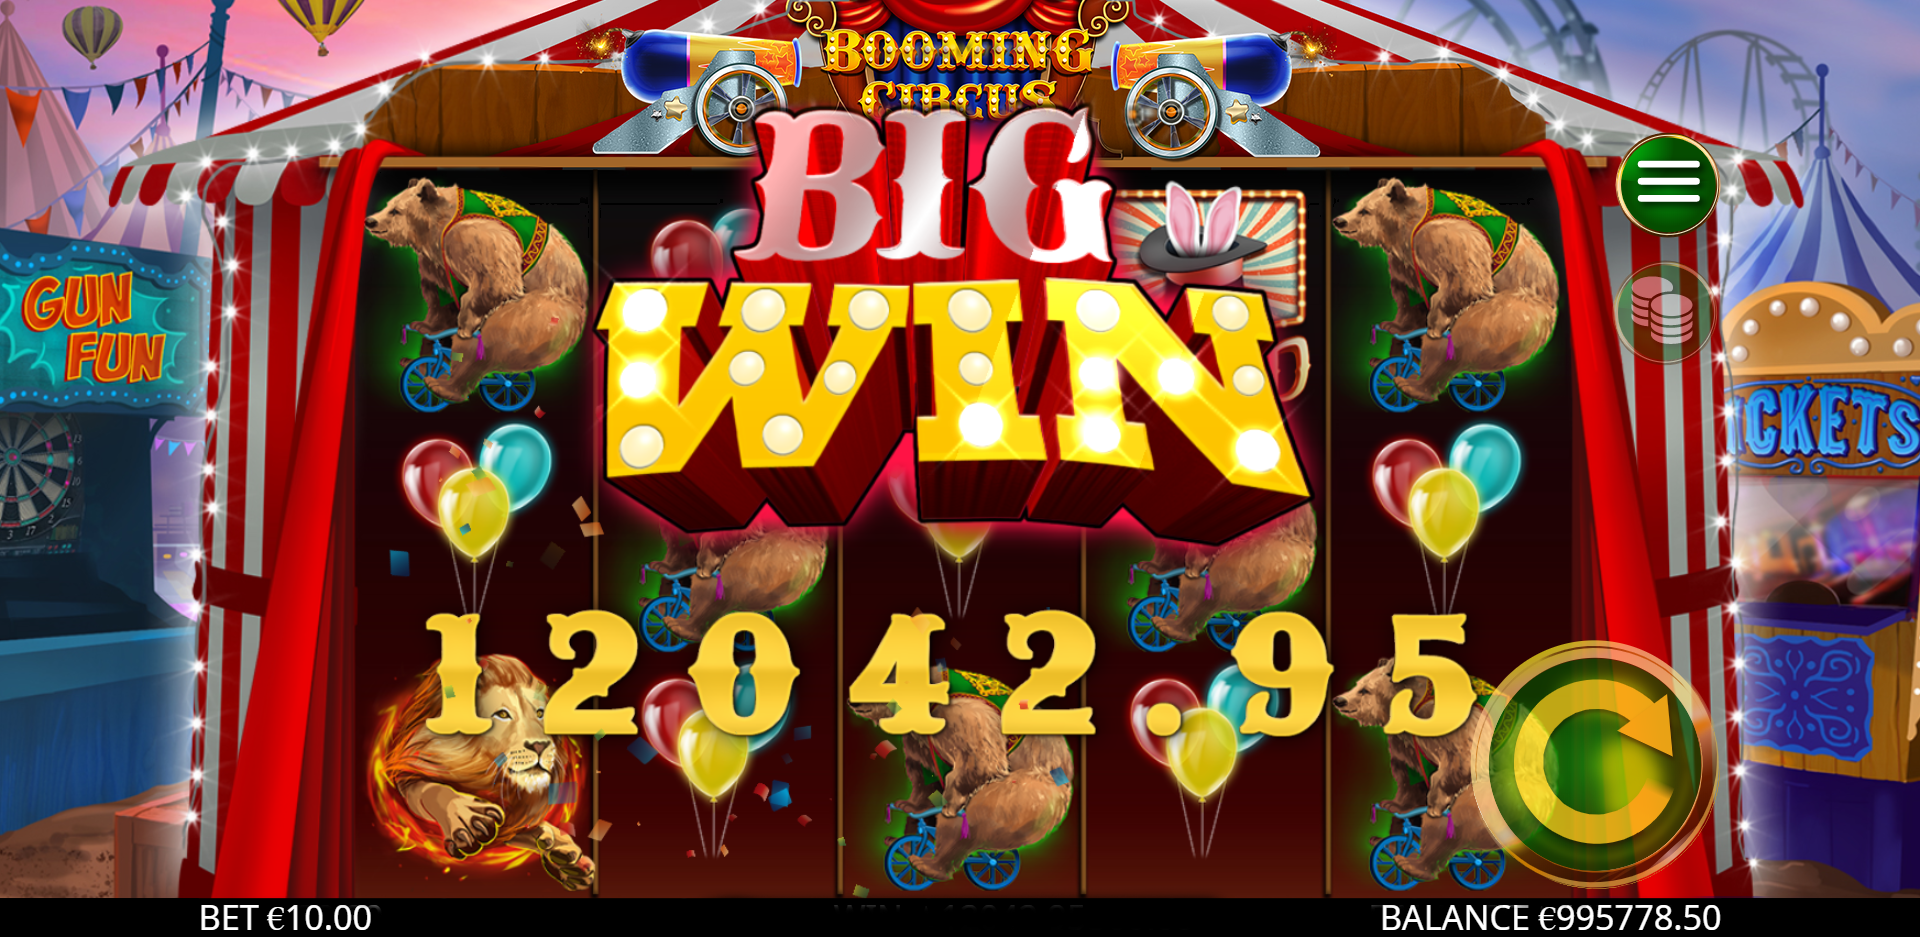 Booming Cirsuc Slot Gameplay